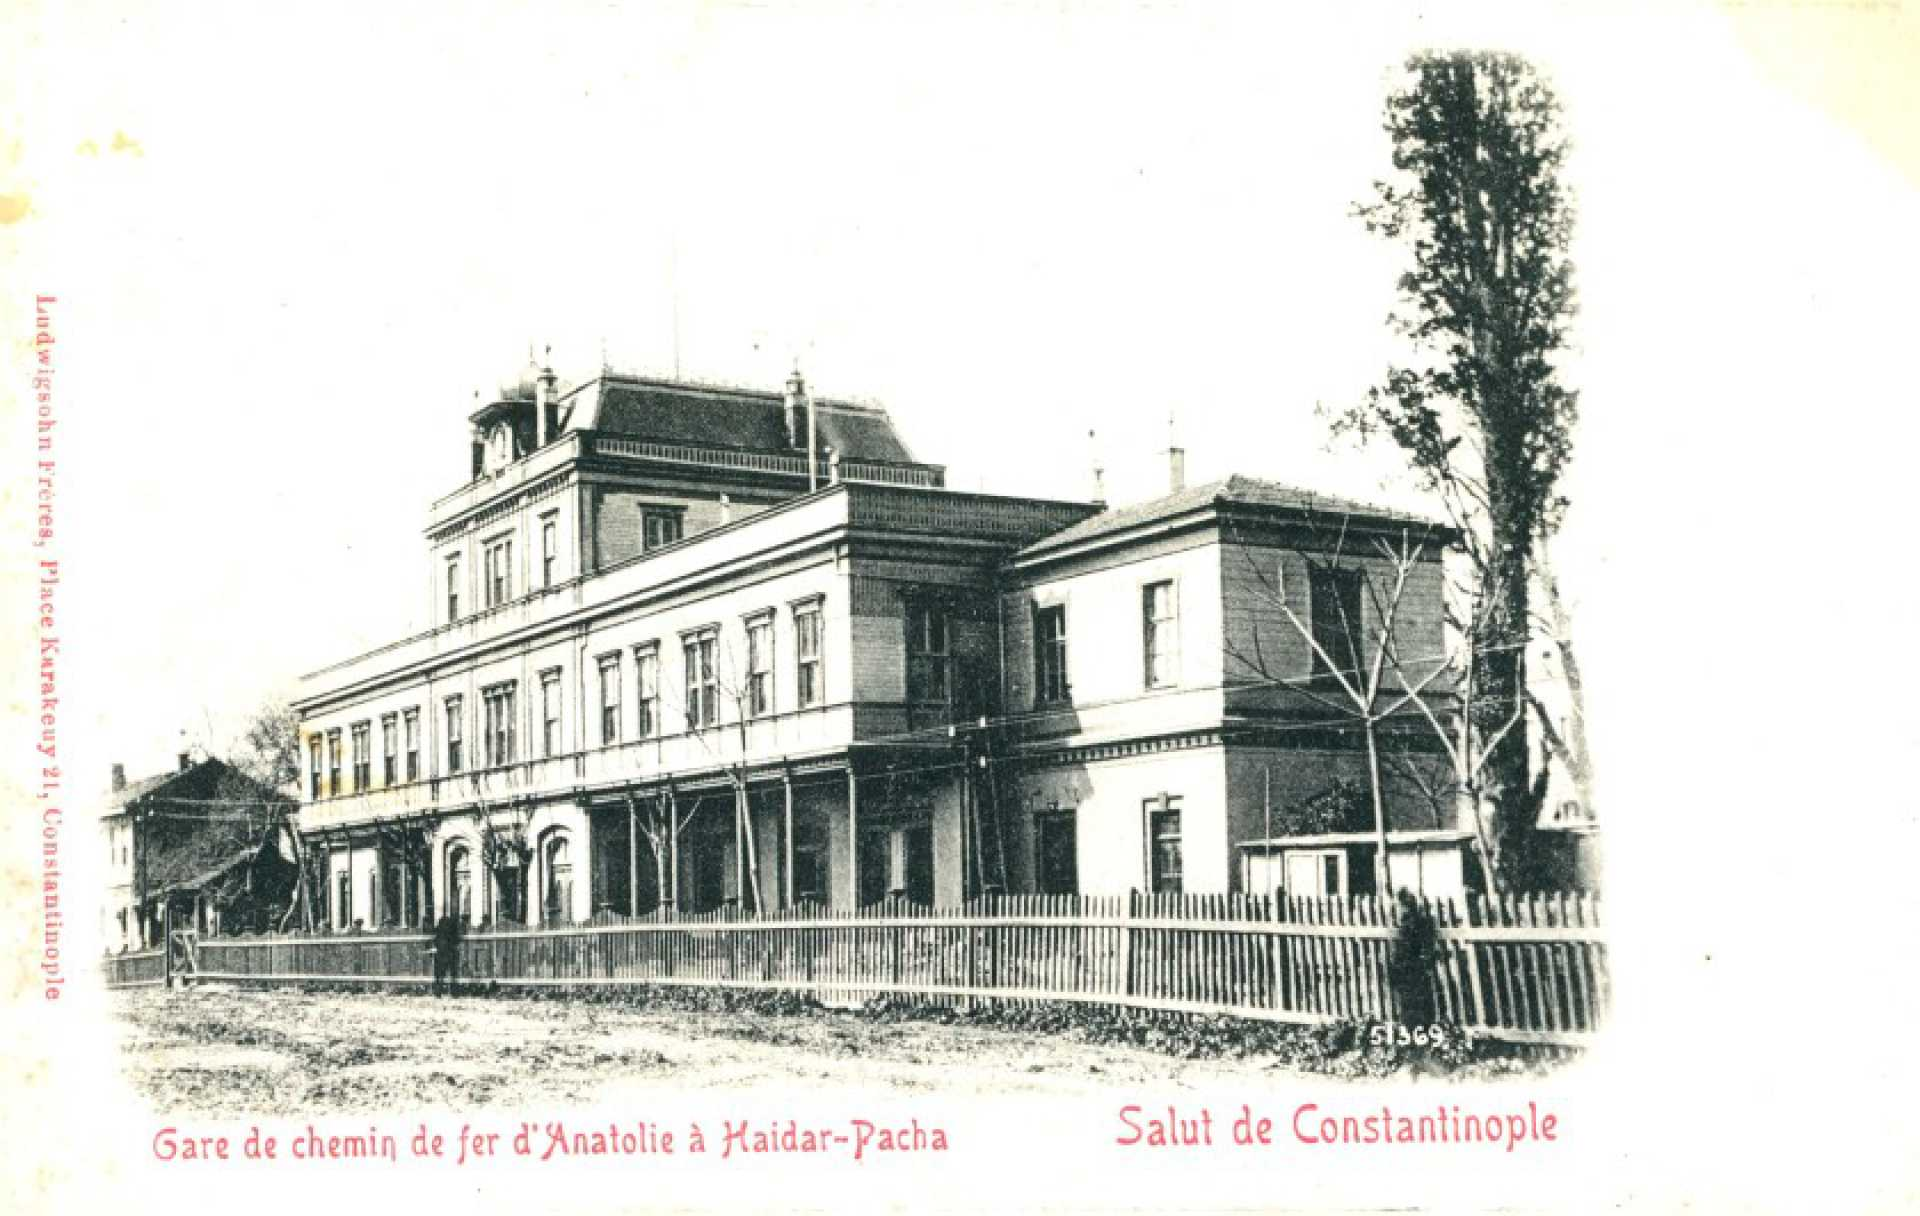 Gare de chemin de fer d'Anatolie a Haidar-Pacha